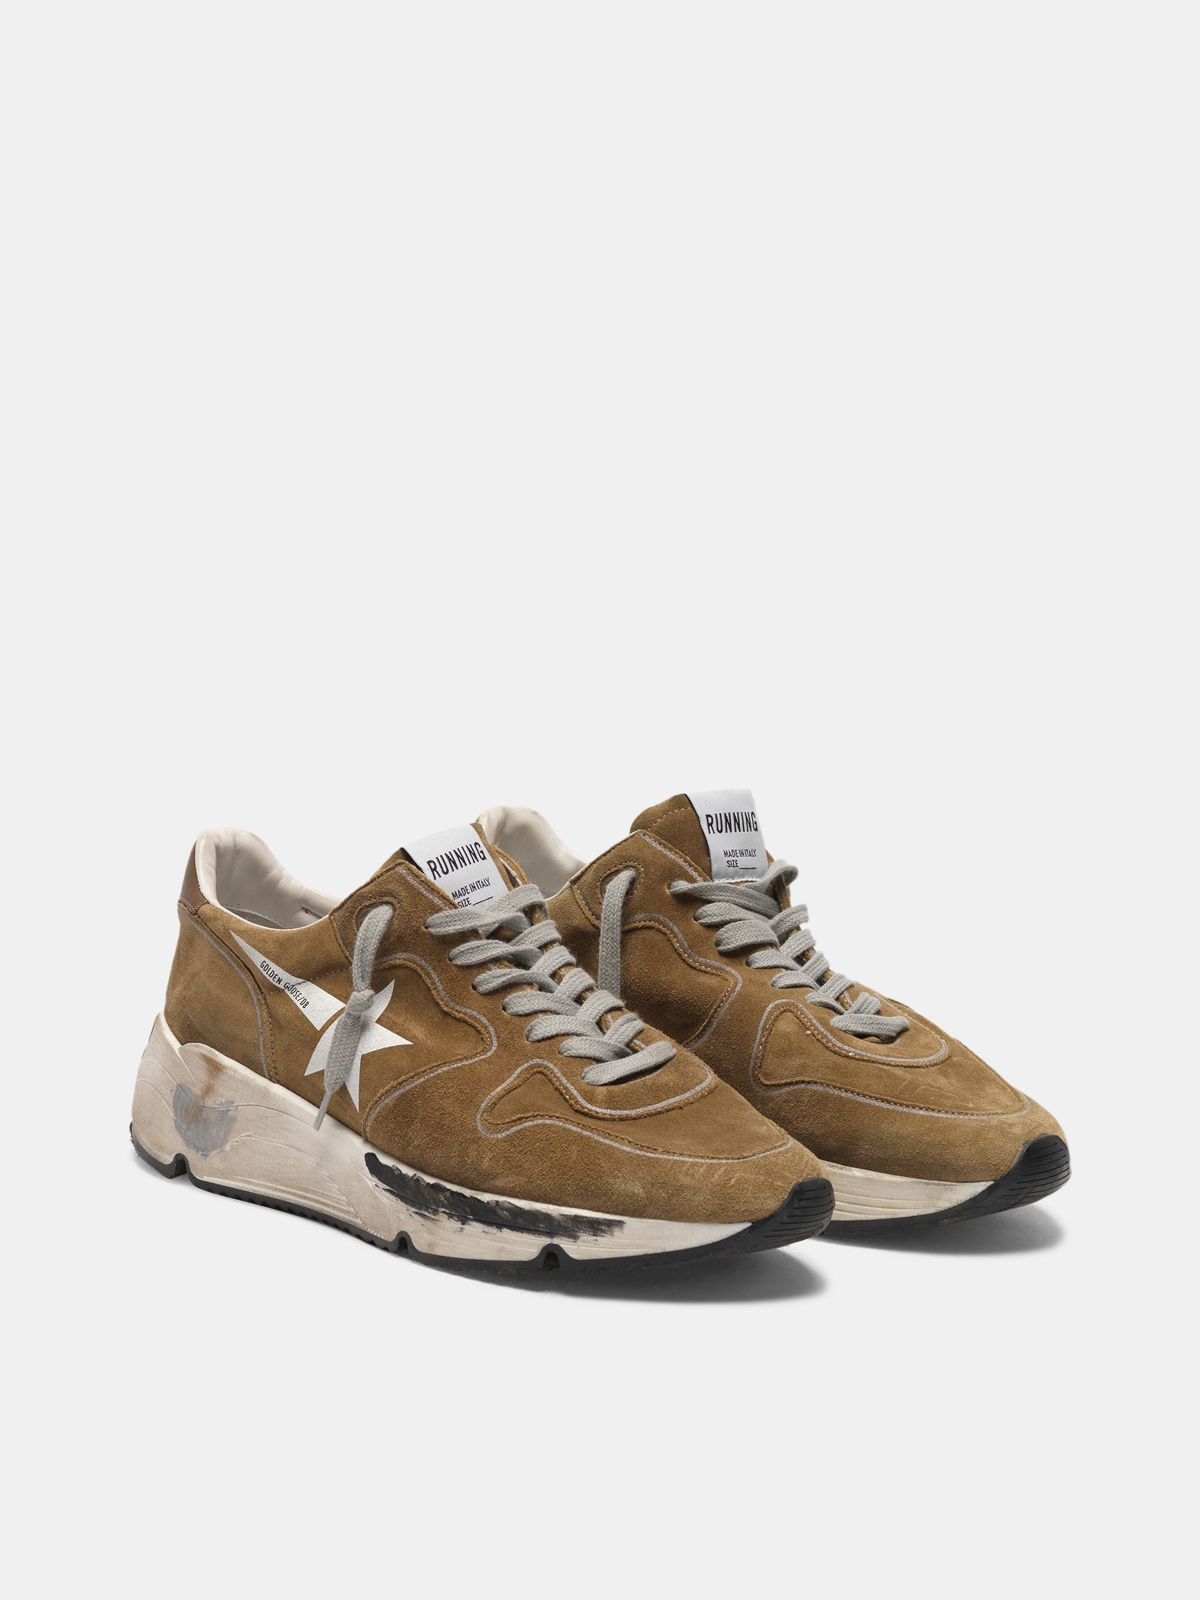 Golden Goose - Sneakers Running Sole in suede con stella bianca in